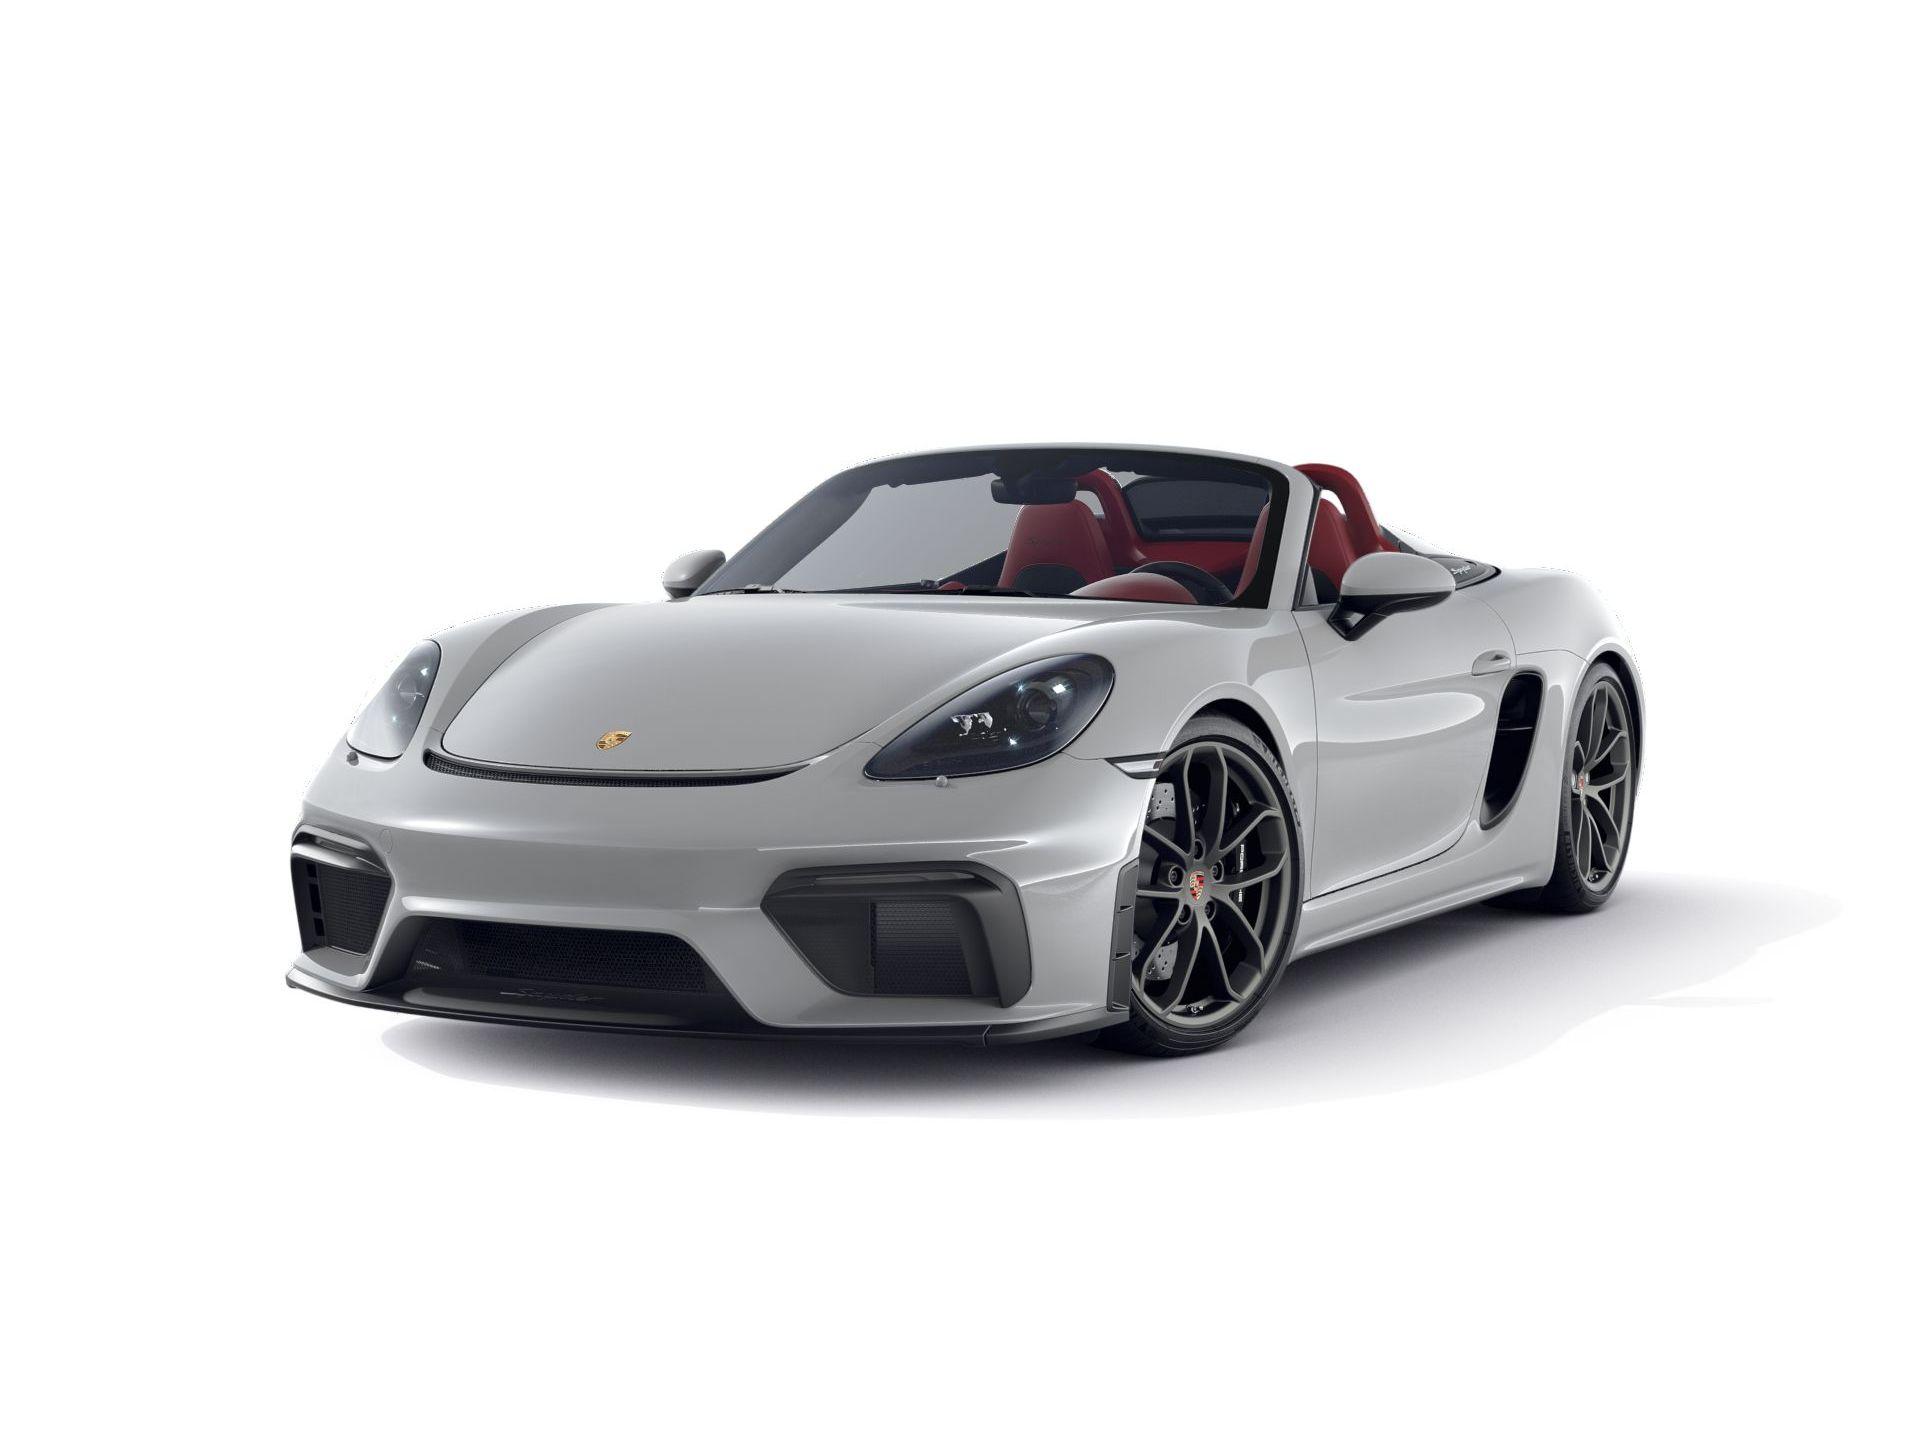 2022 Porsche 718 Spyder – 1